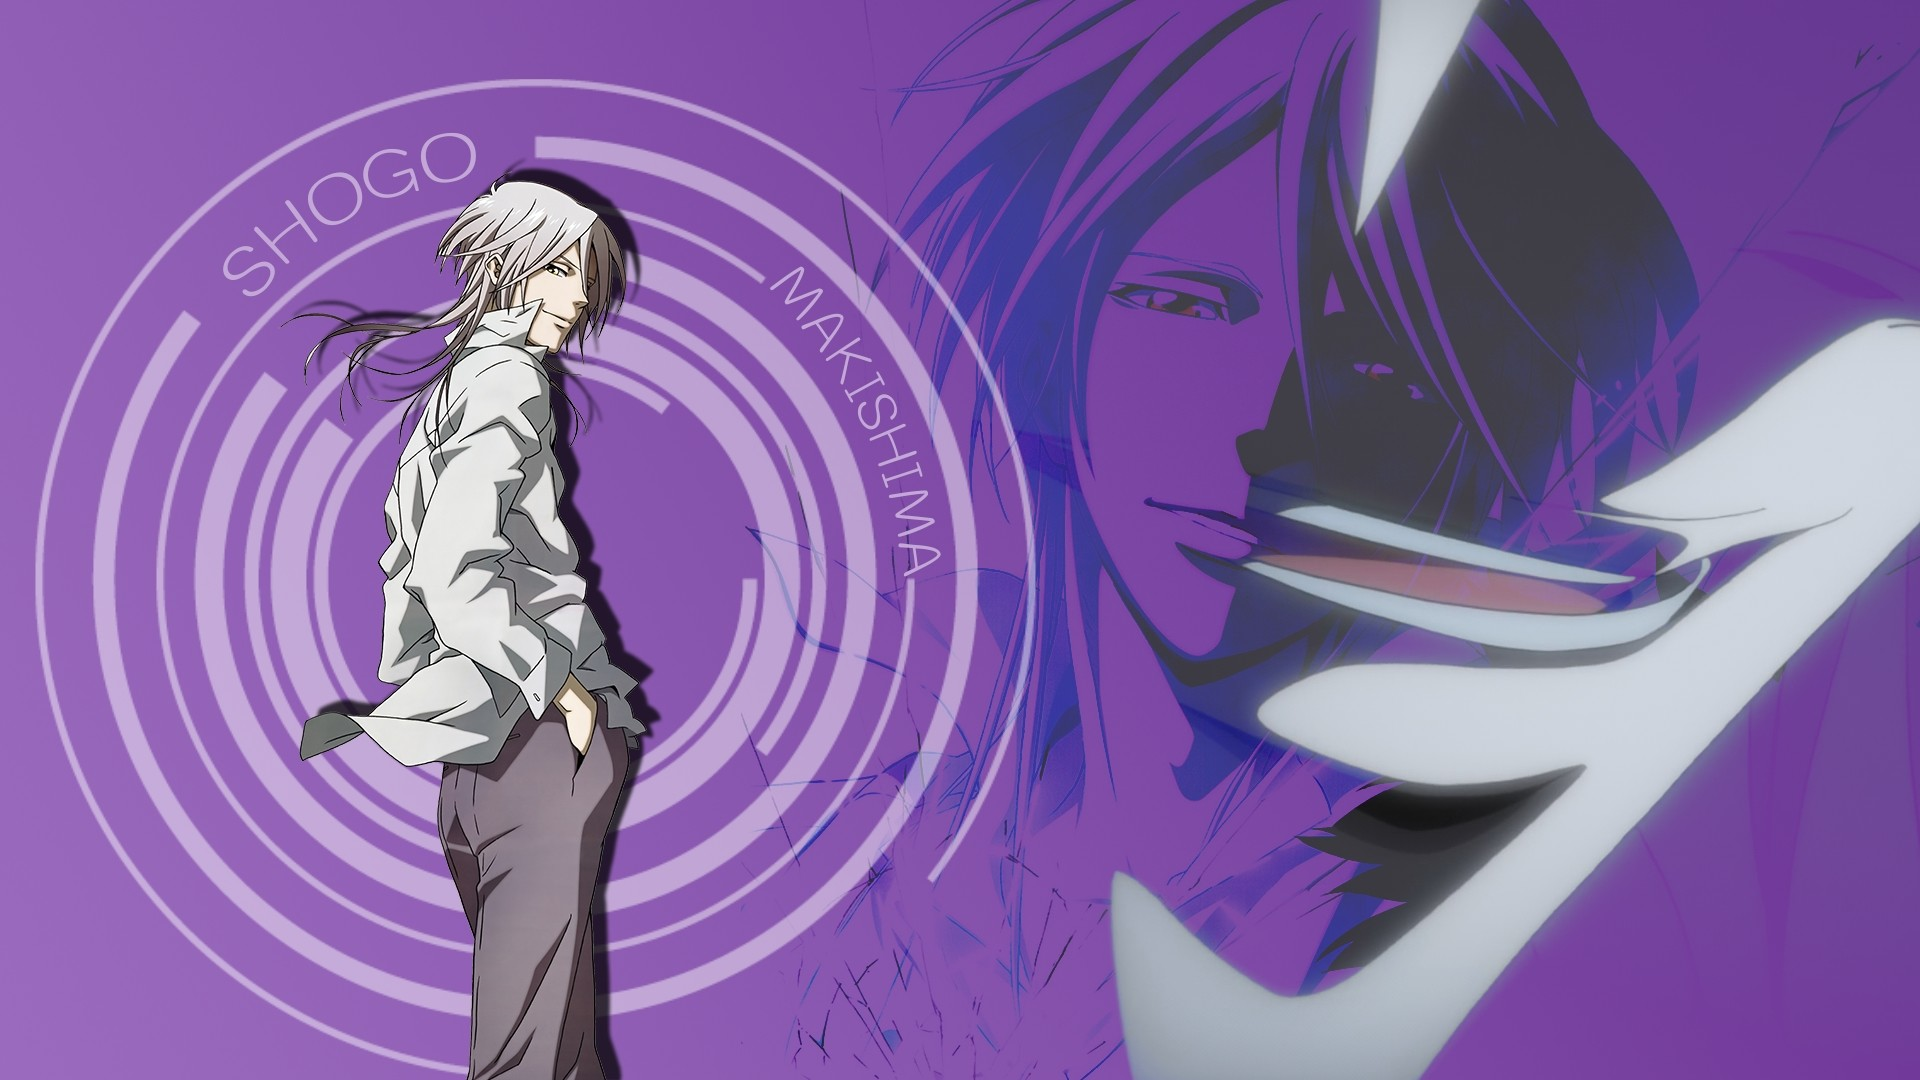 Makishima Shougo · download Makishima Shougo image · 24 Fav PSYCHO-PASS